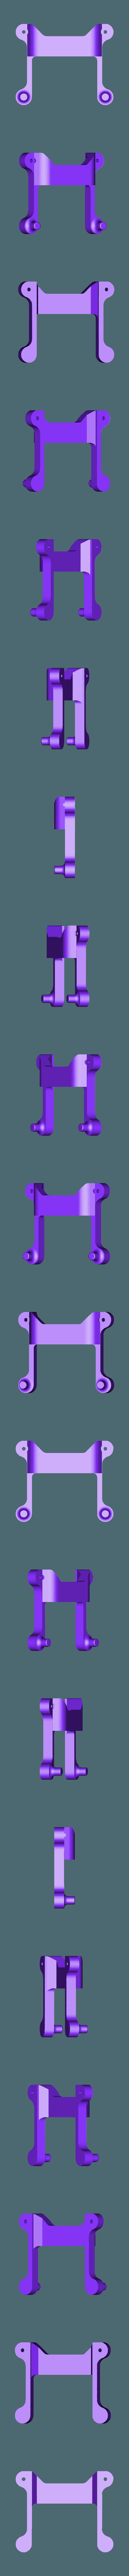 monitor_halter_optimiert.stl Download free STL file Monitor Screen Holder - adjustable • 3D printer design, Shruikan-Arts